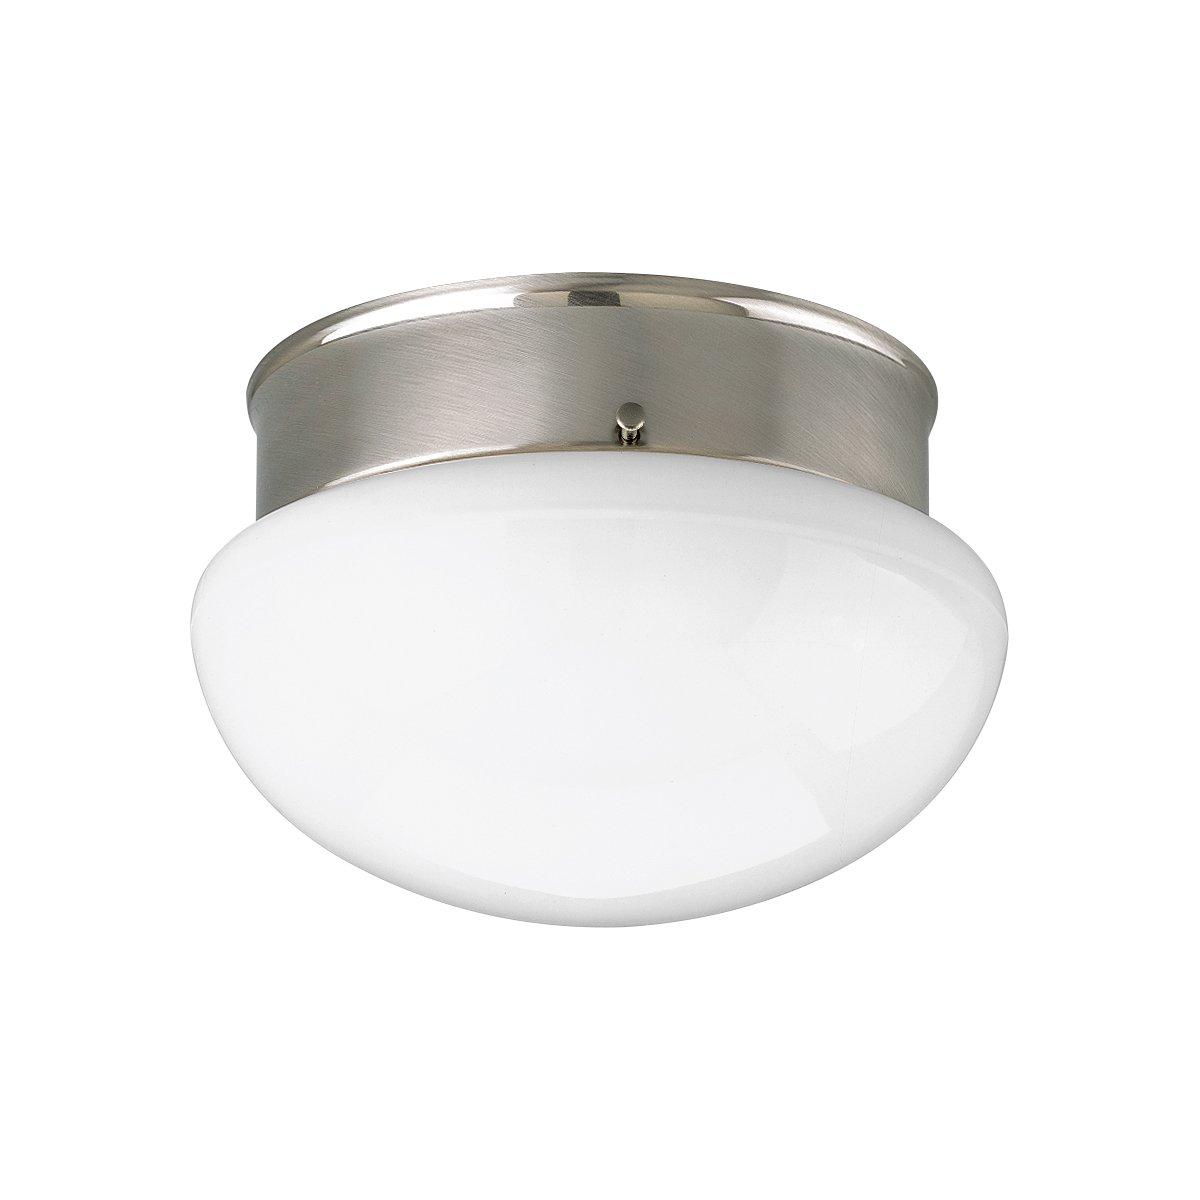 Progress Lighting P3408-09 1-Light Close-To-Ceiling Fixture, Brushed Nickel